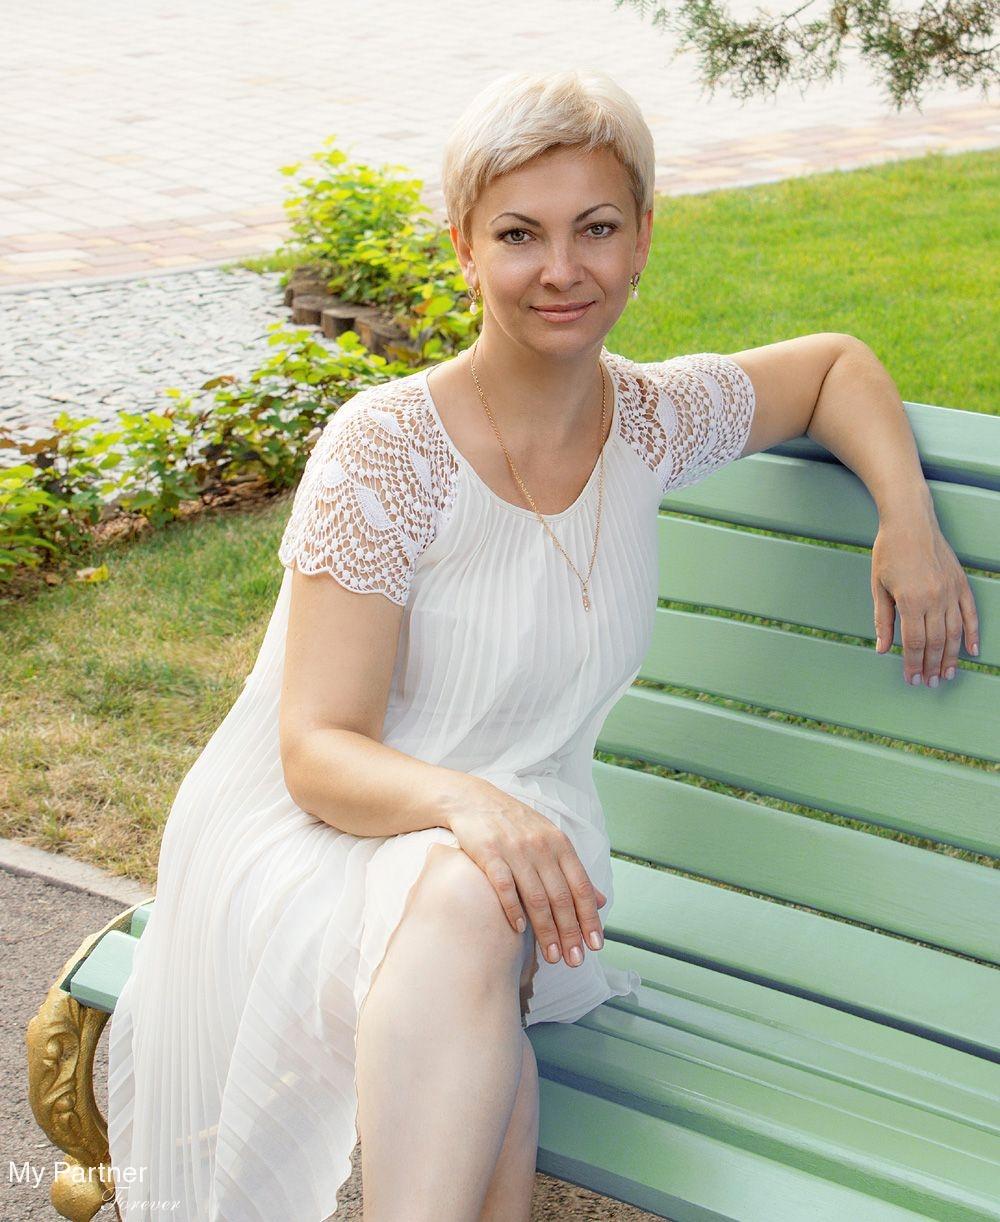 Meet beautiful russian woman and 1:42-4:40 fav